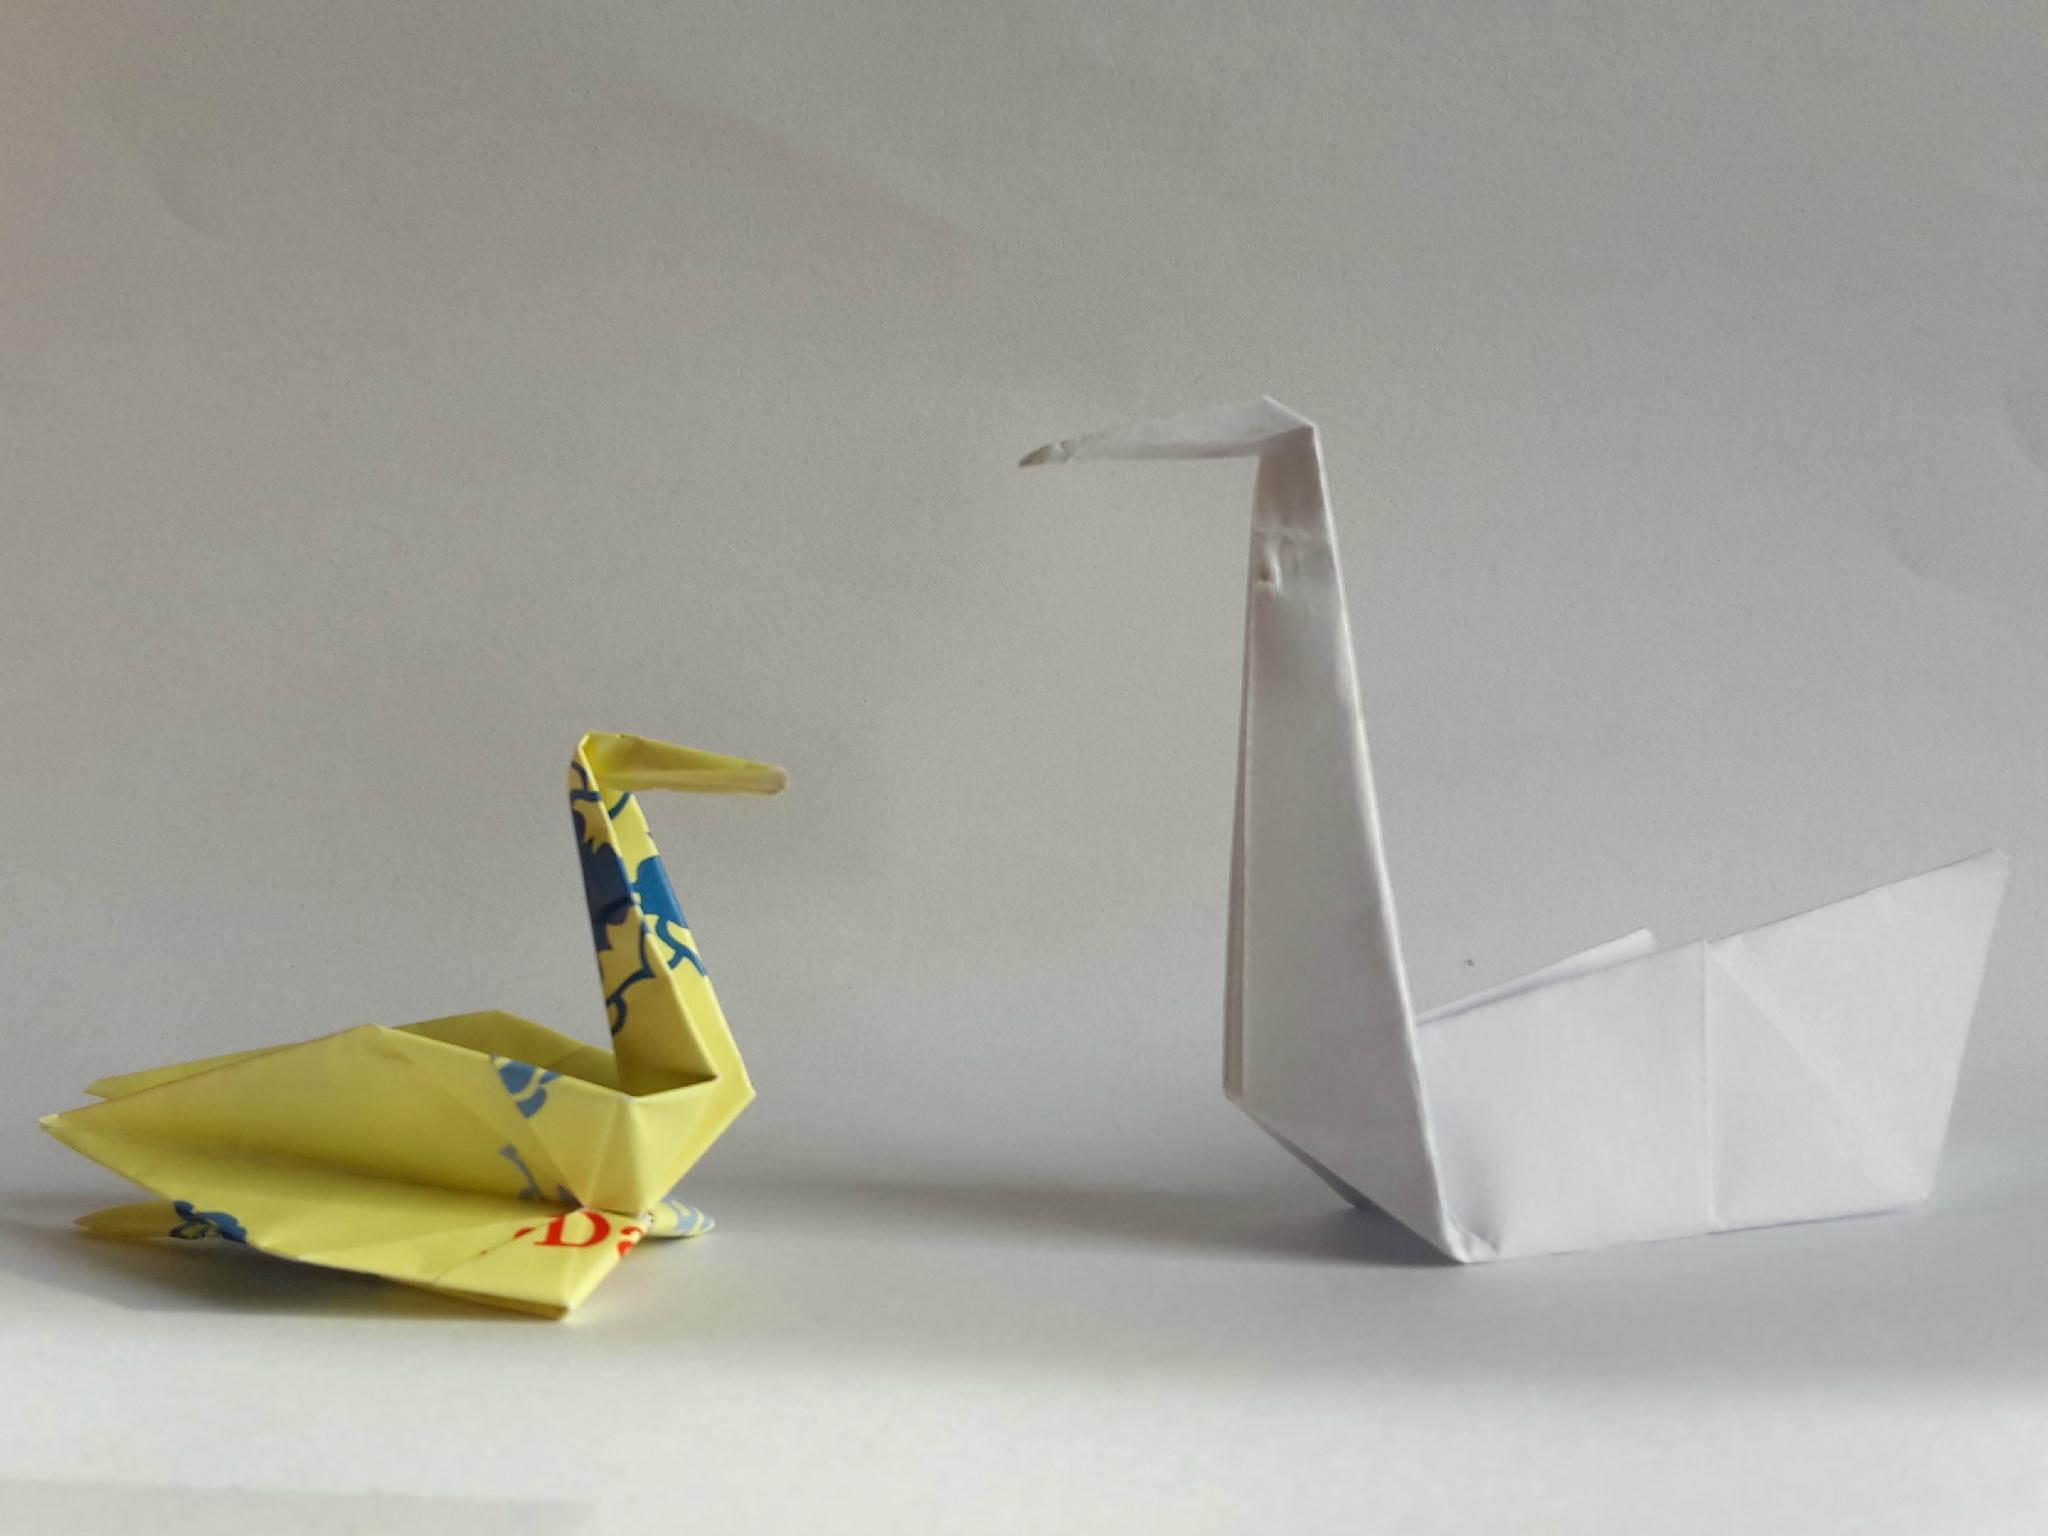 Canard, Origami, - Photo De 7_Origami - Les Petits Choux dedans Origami Canard